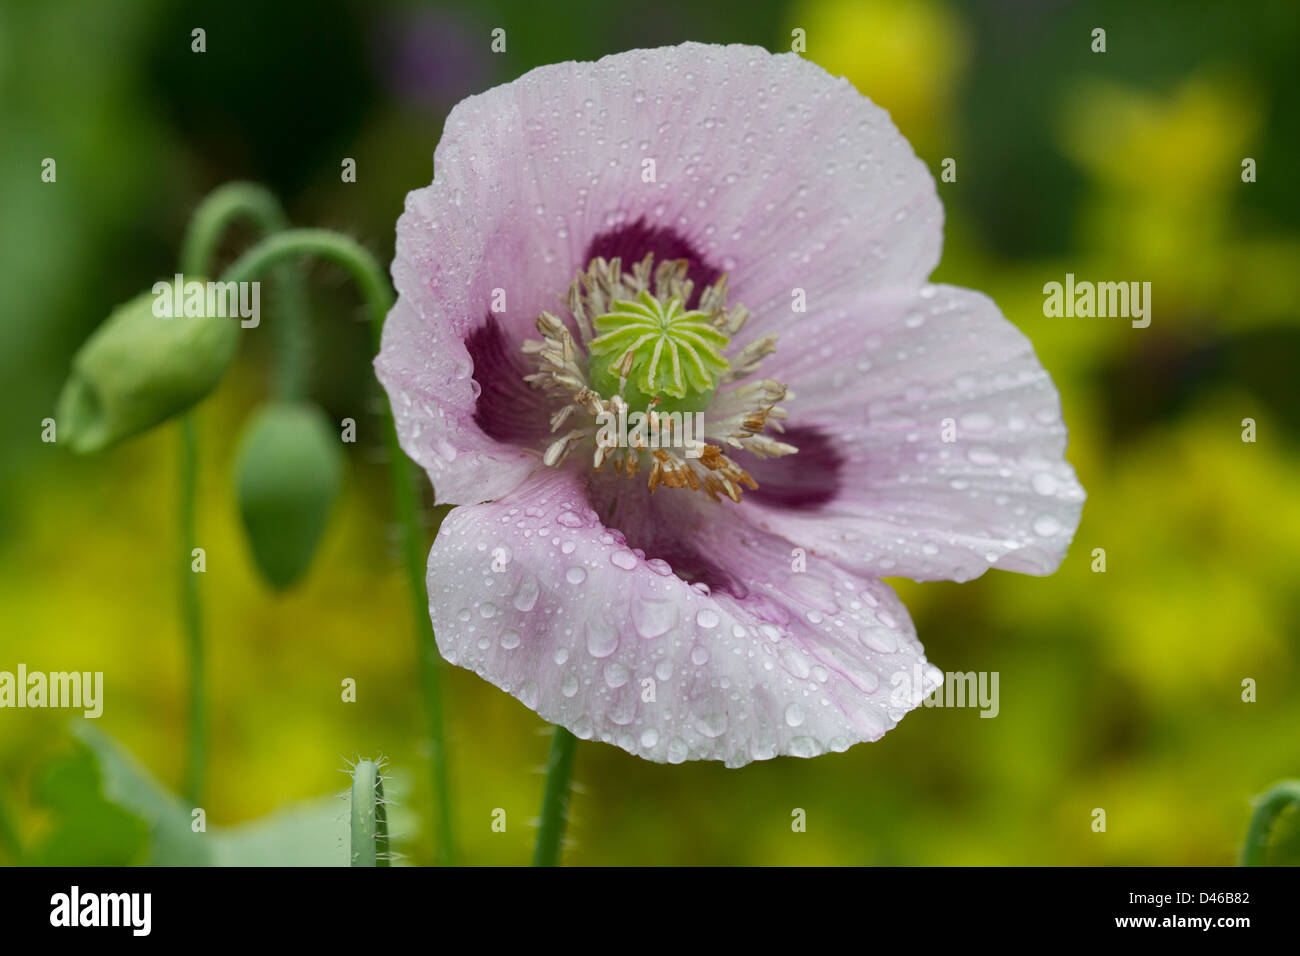 Purple and lilac opium poppy flower in garden in england stock photo purple and lilac opium poppy flower in garden in england mightylinksfo Gallery